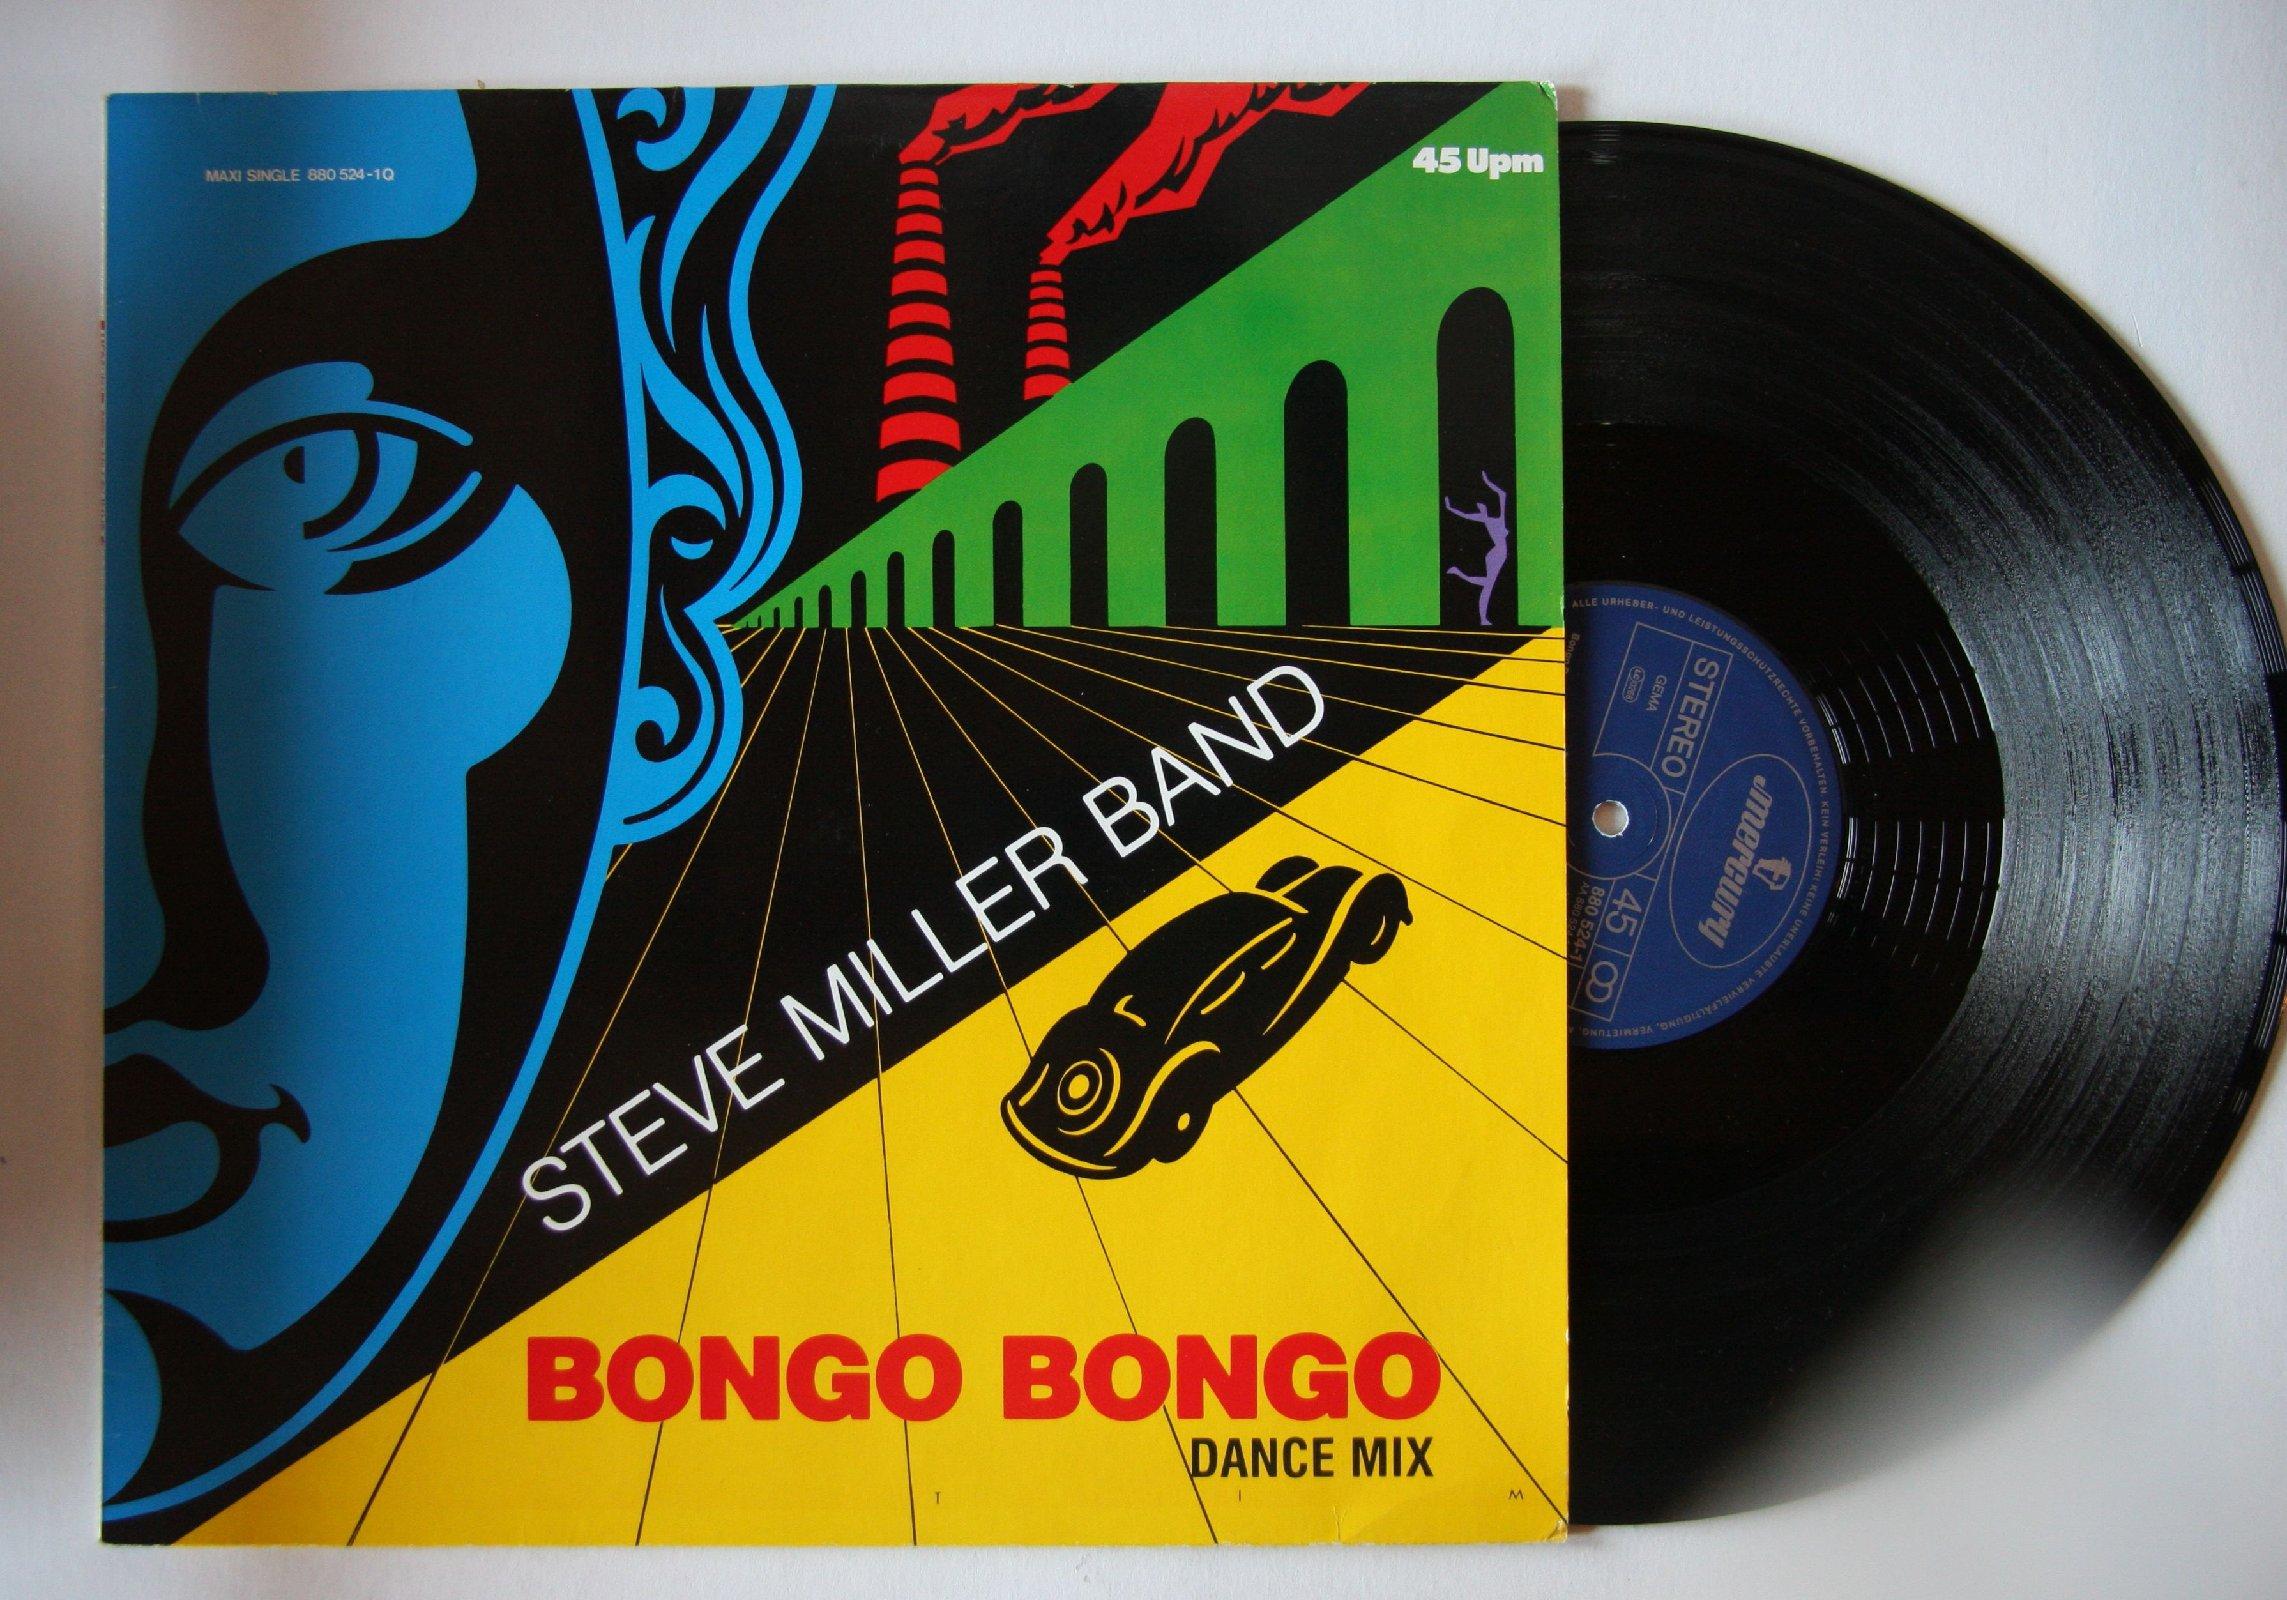 Steve Miller - Bongo Bongo CD